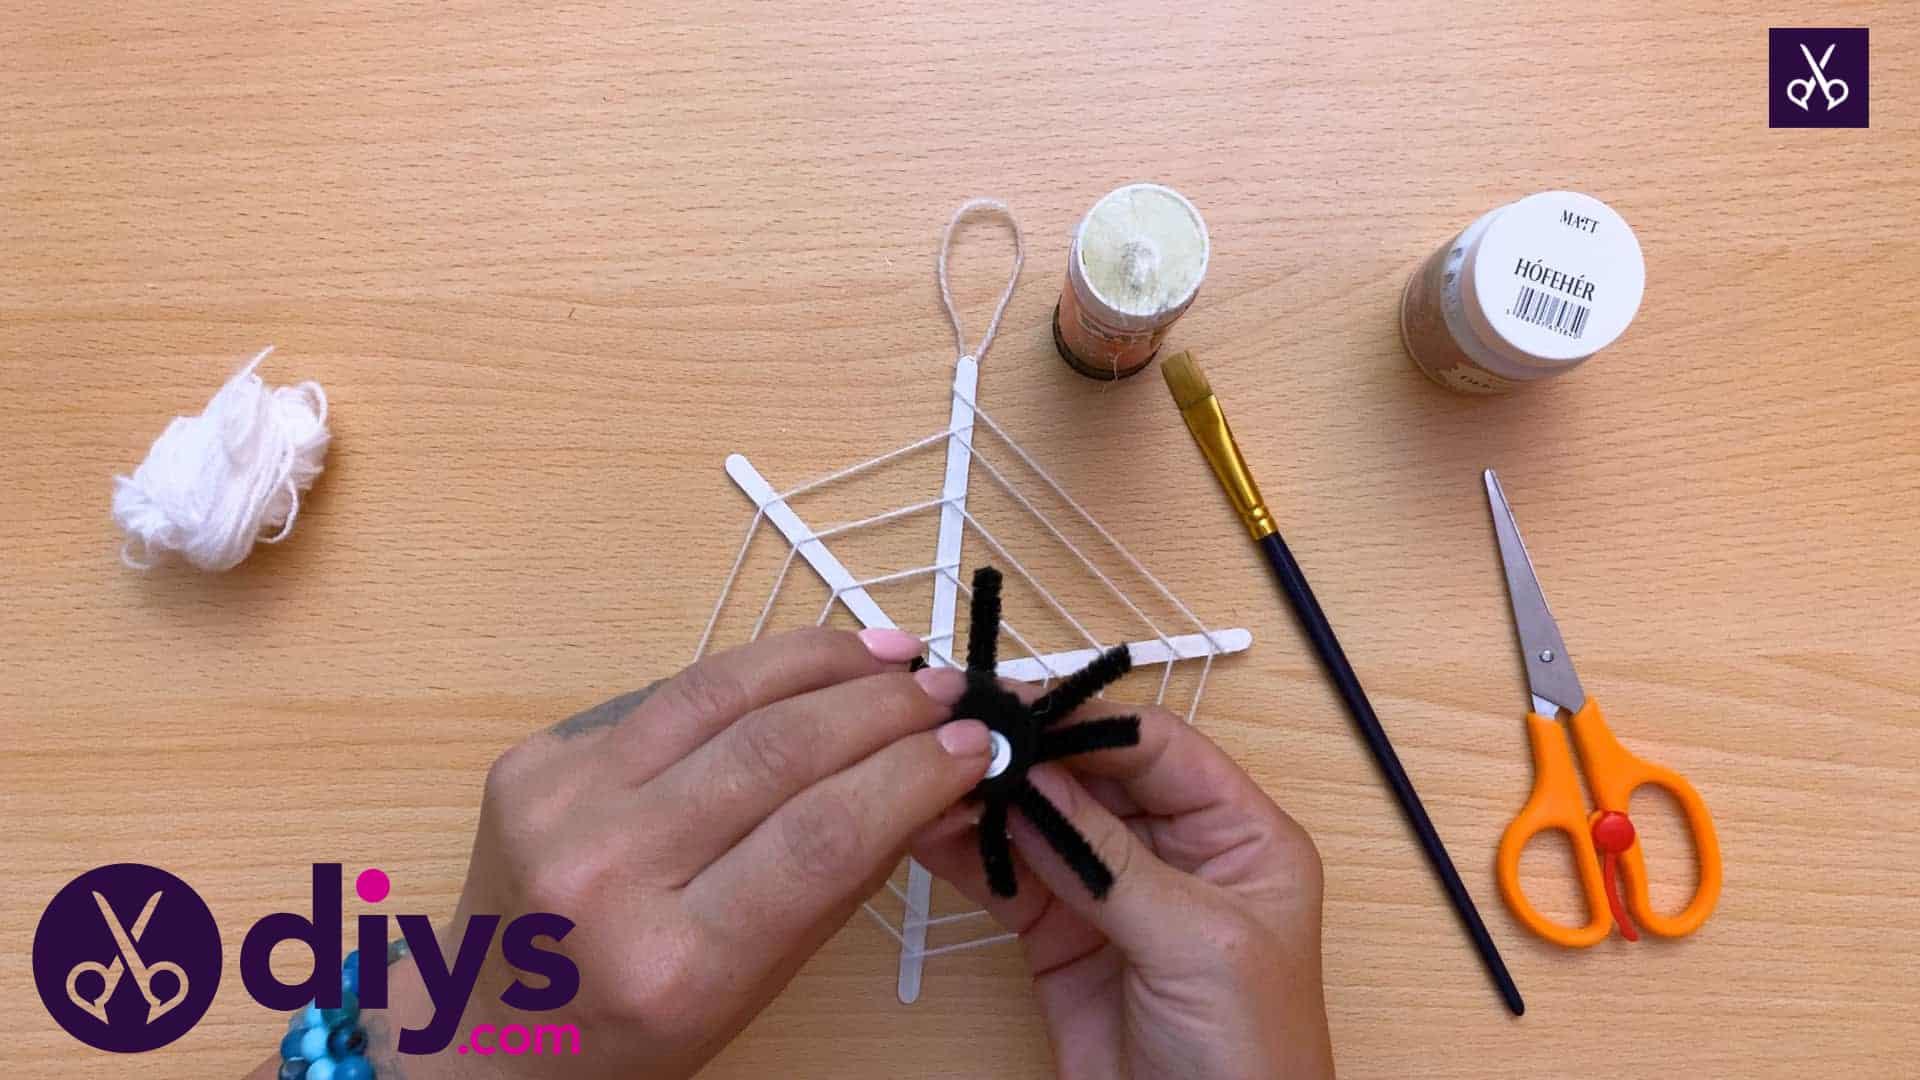 Diy spider web decoration for halloween craft